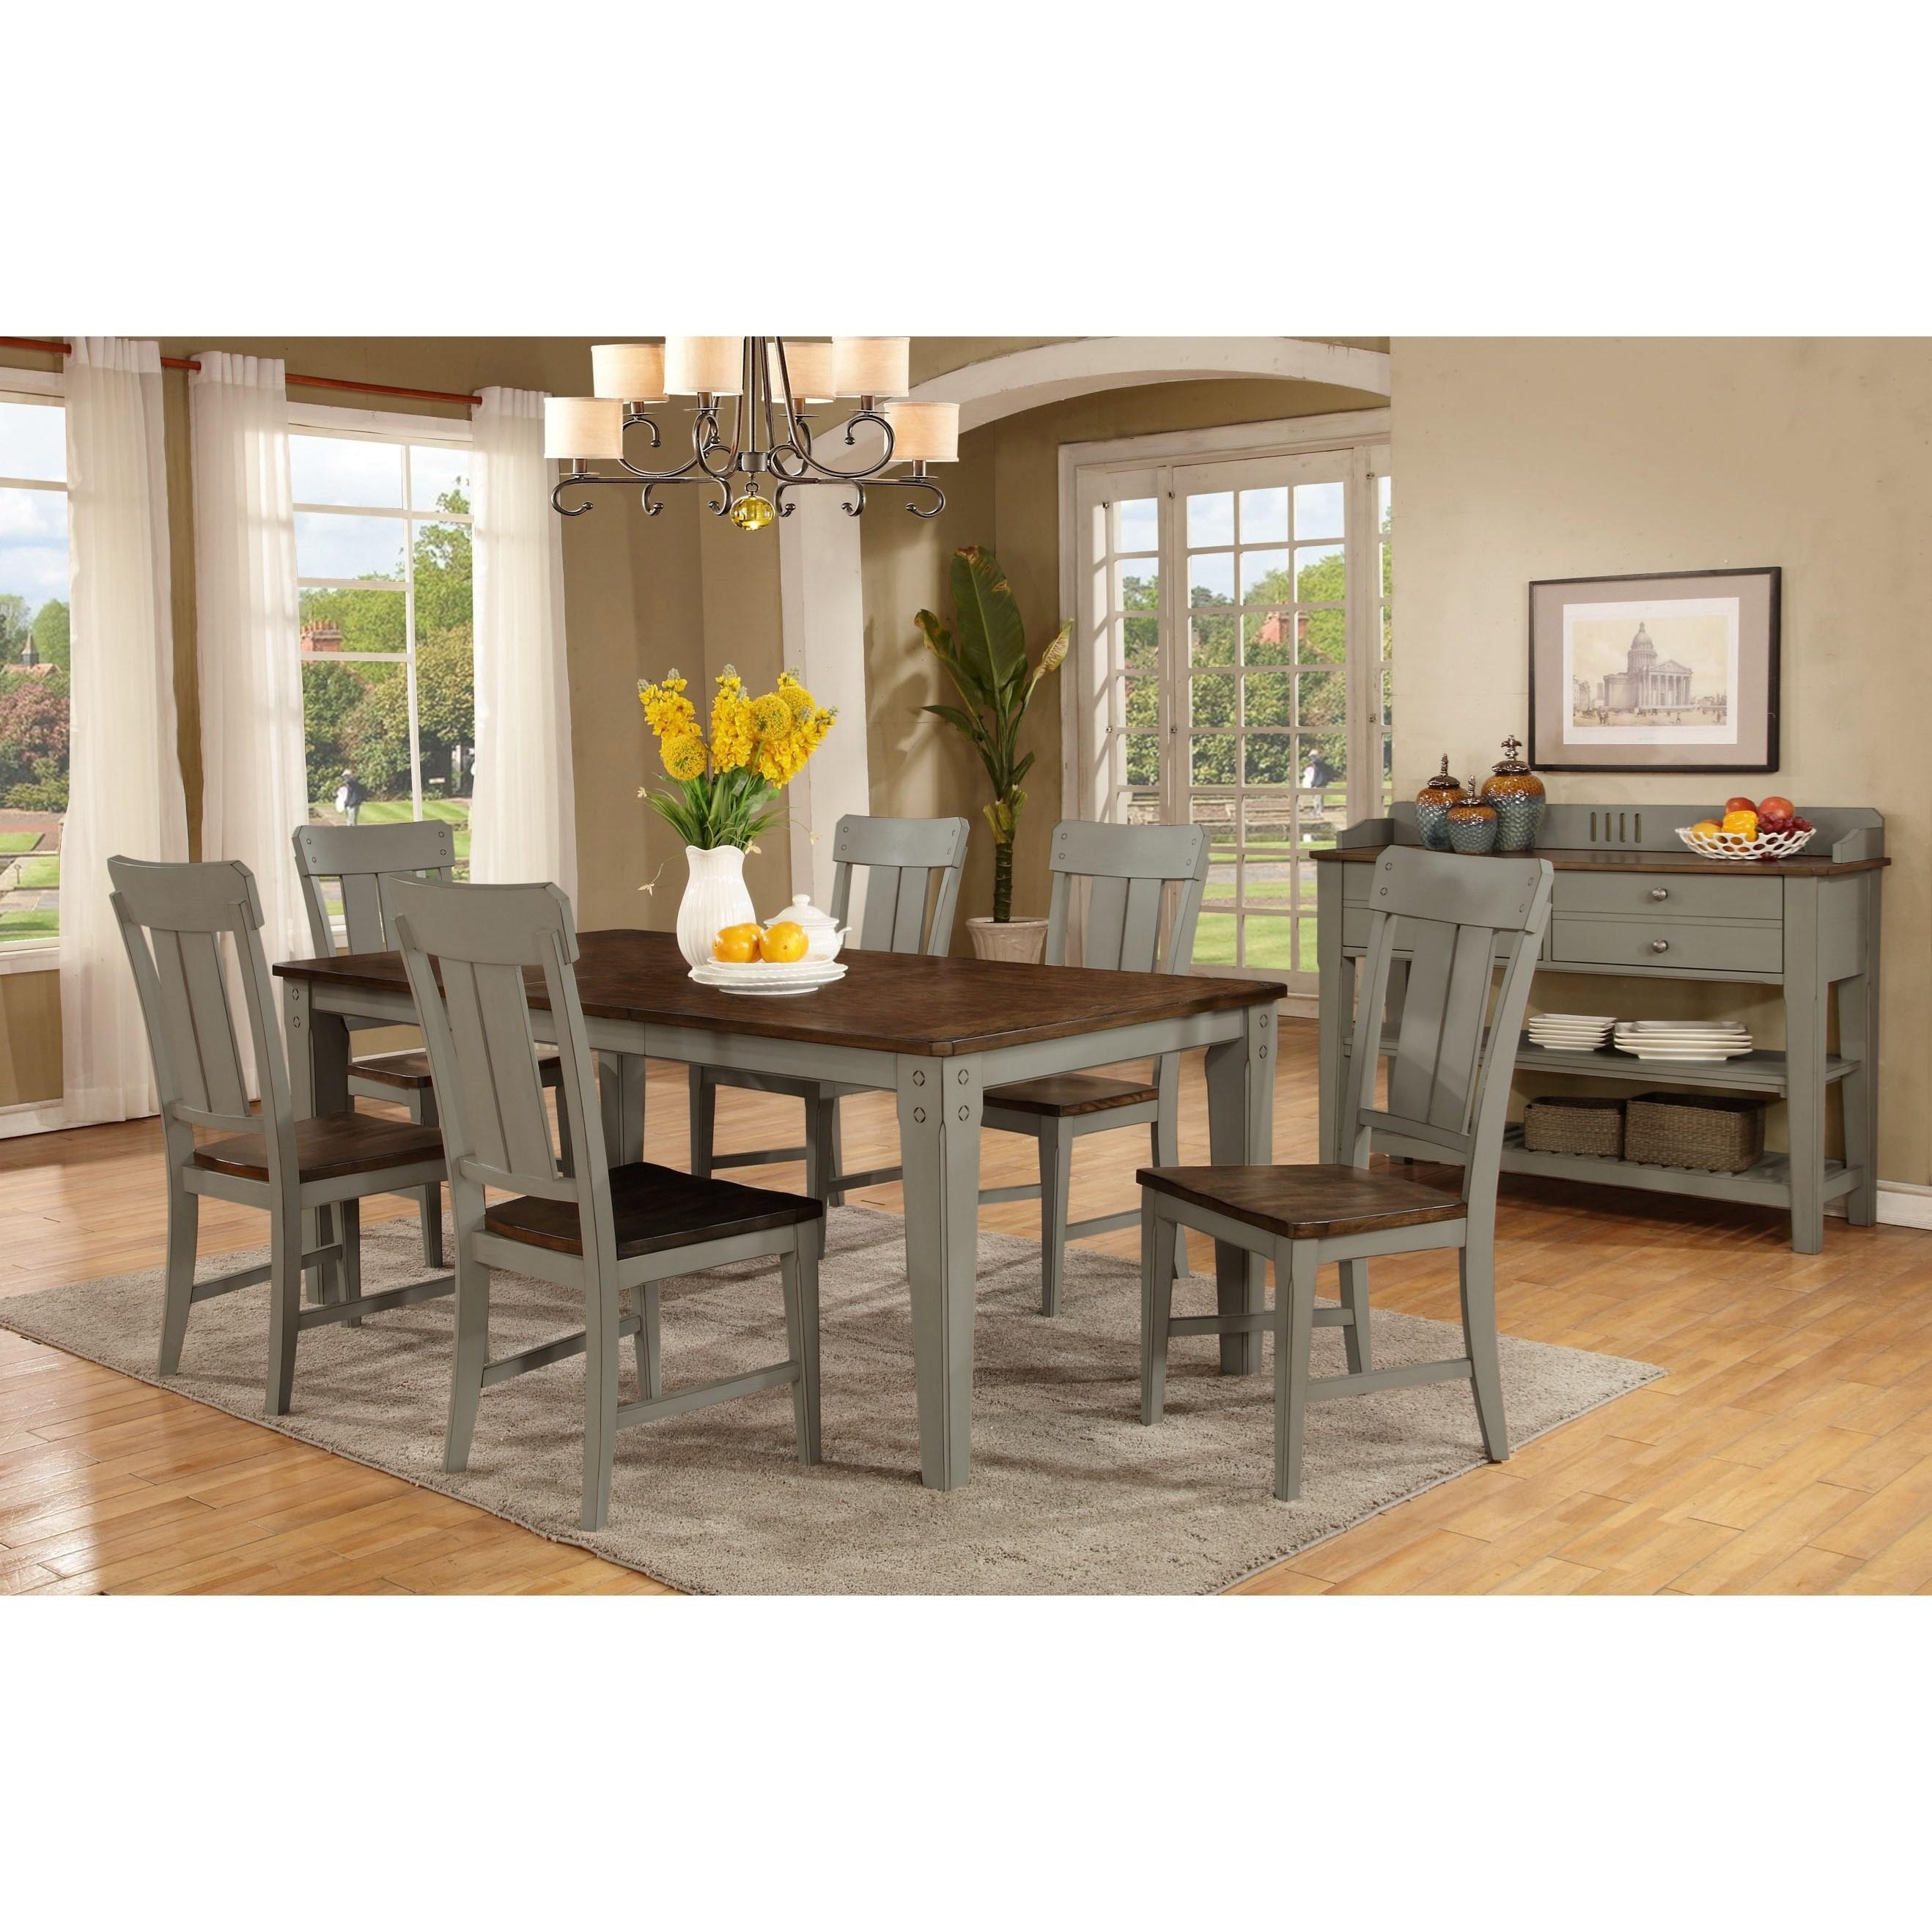 ... Avalon Furniture Shaker Nouveau7 Piece Dining Table Set